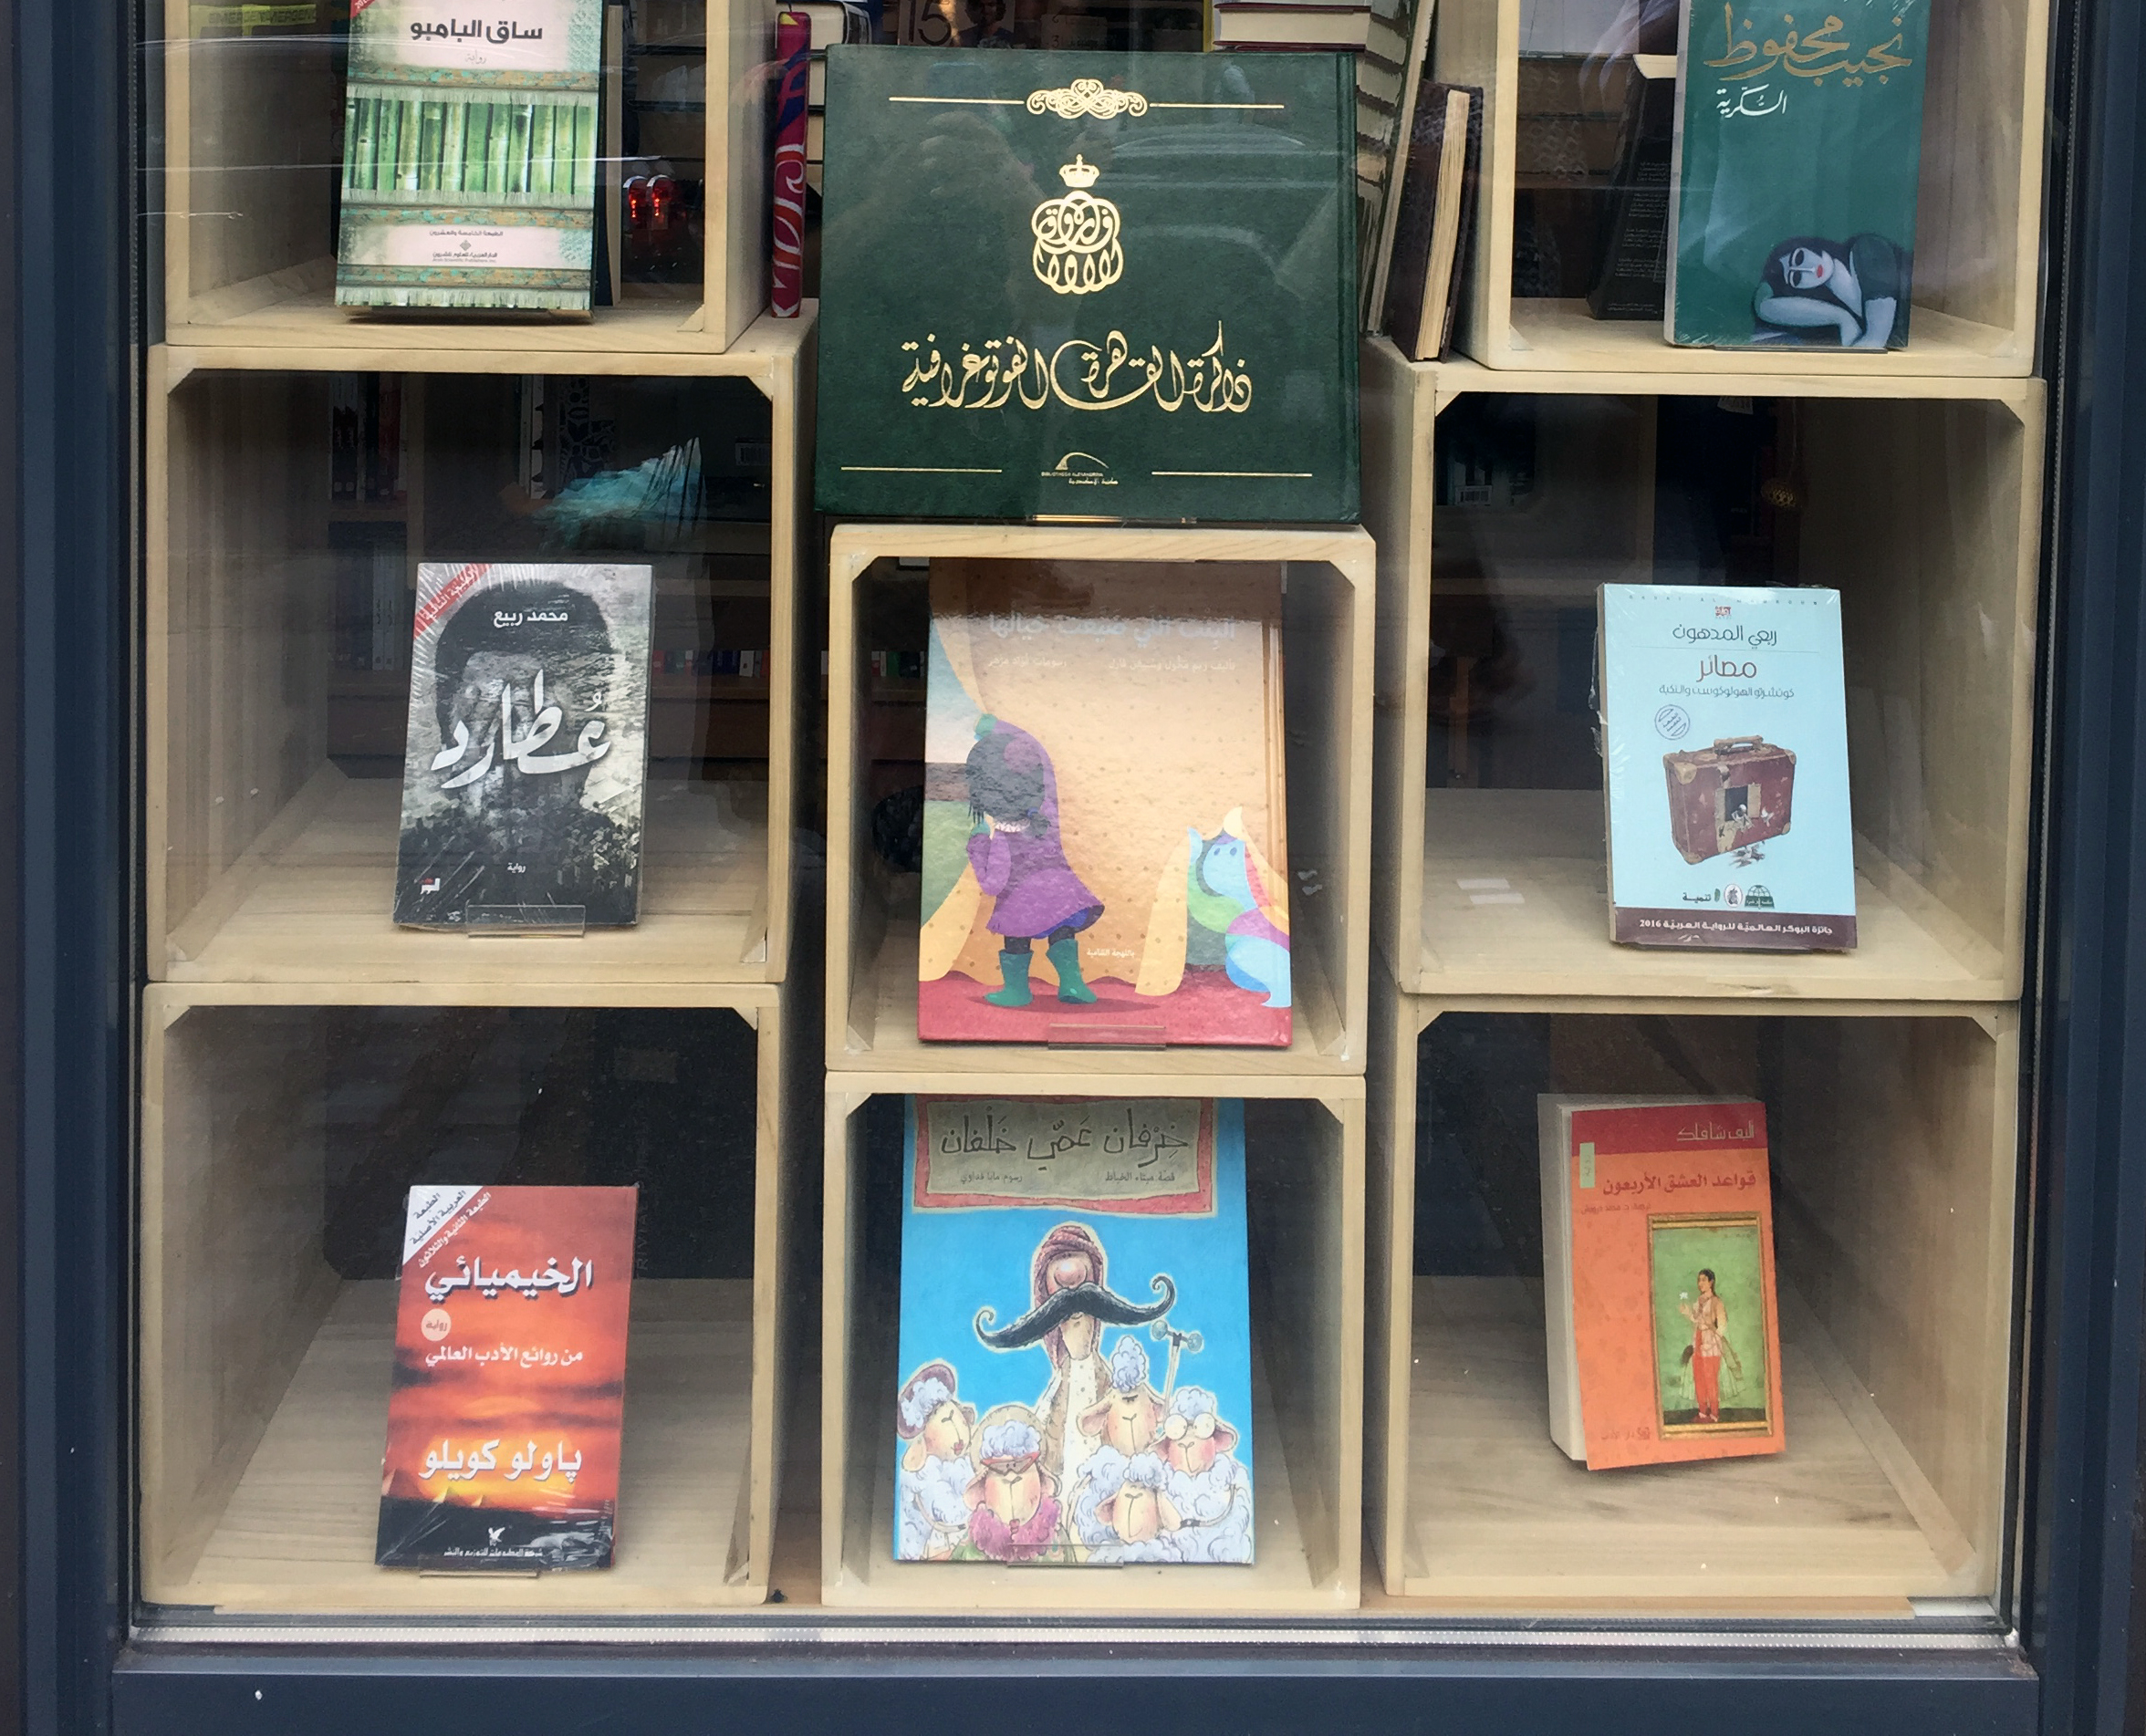 ALEF BOOK STORE WINDOW CROP.jpg